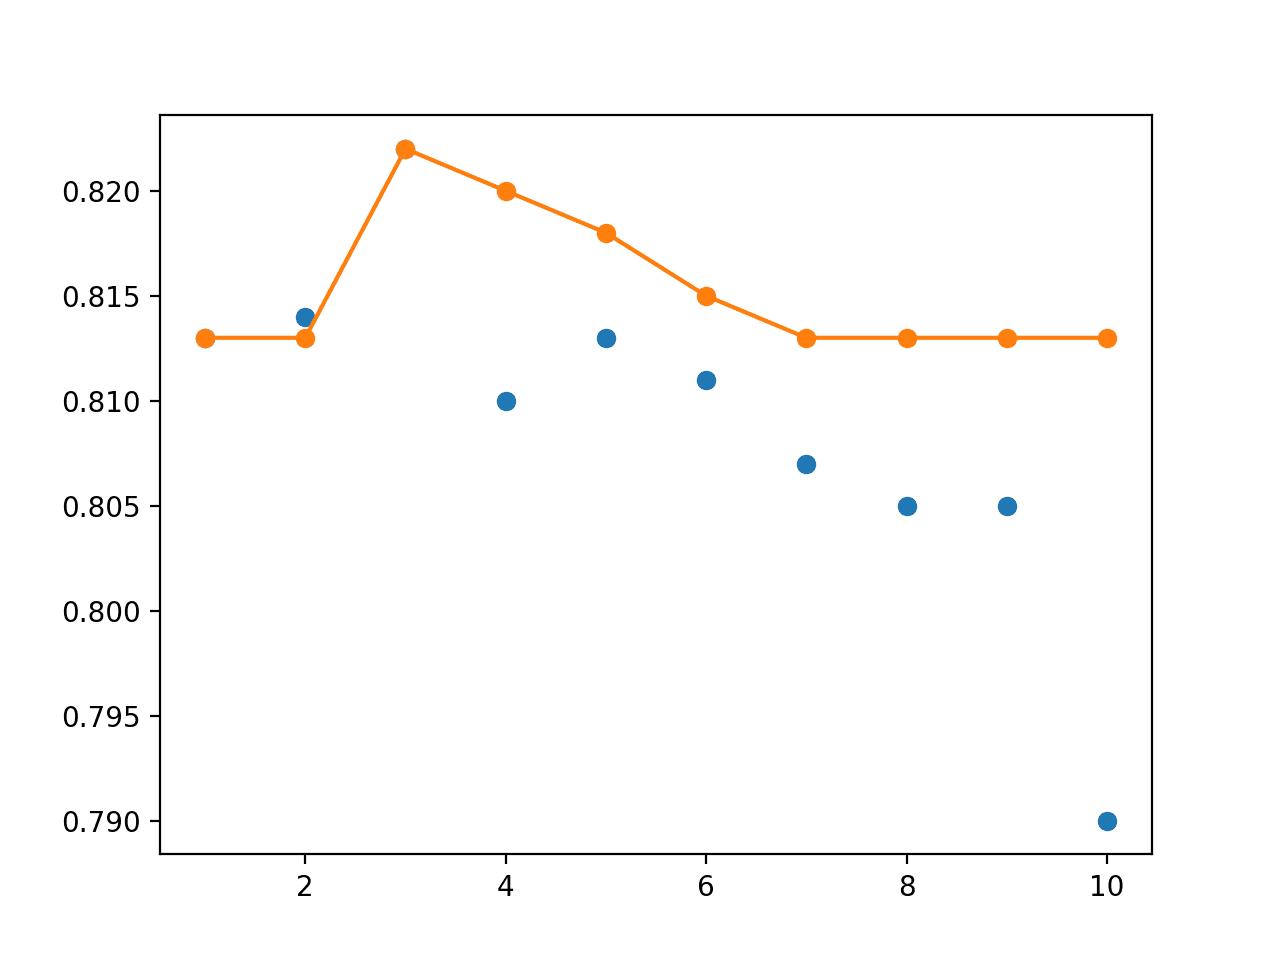 Line Plot of Single Snapshot Models (blue dots) vs Snapshot Ensembles of Varied Sized (orange line)